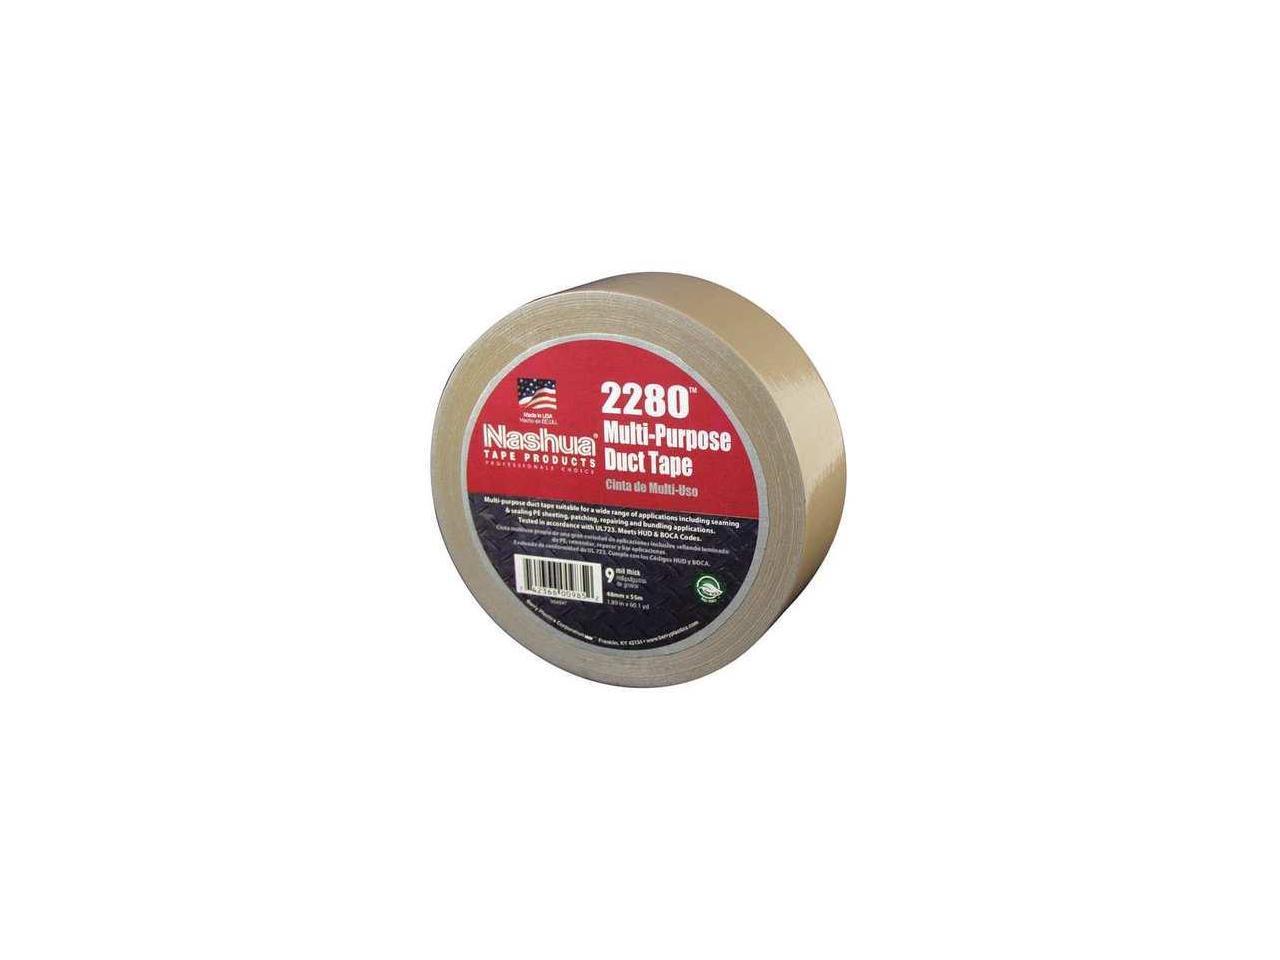 NASHUA 2280 Duct Tape,48mm x 55m,9 mil,Tan